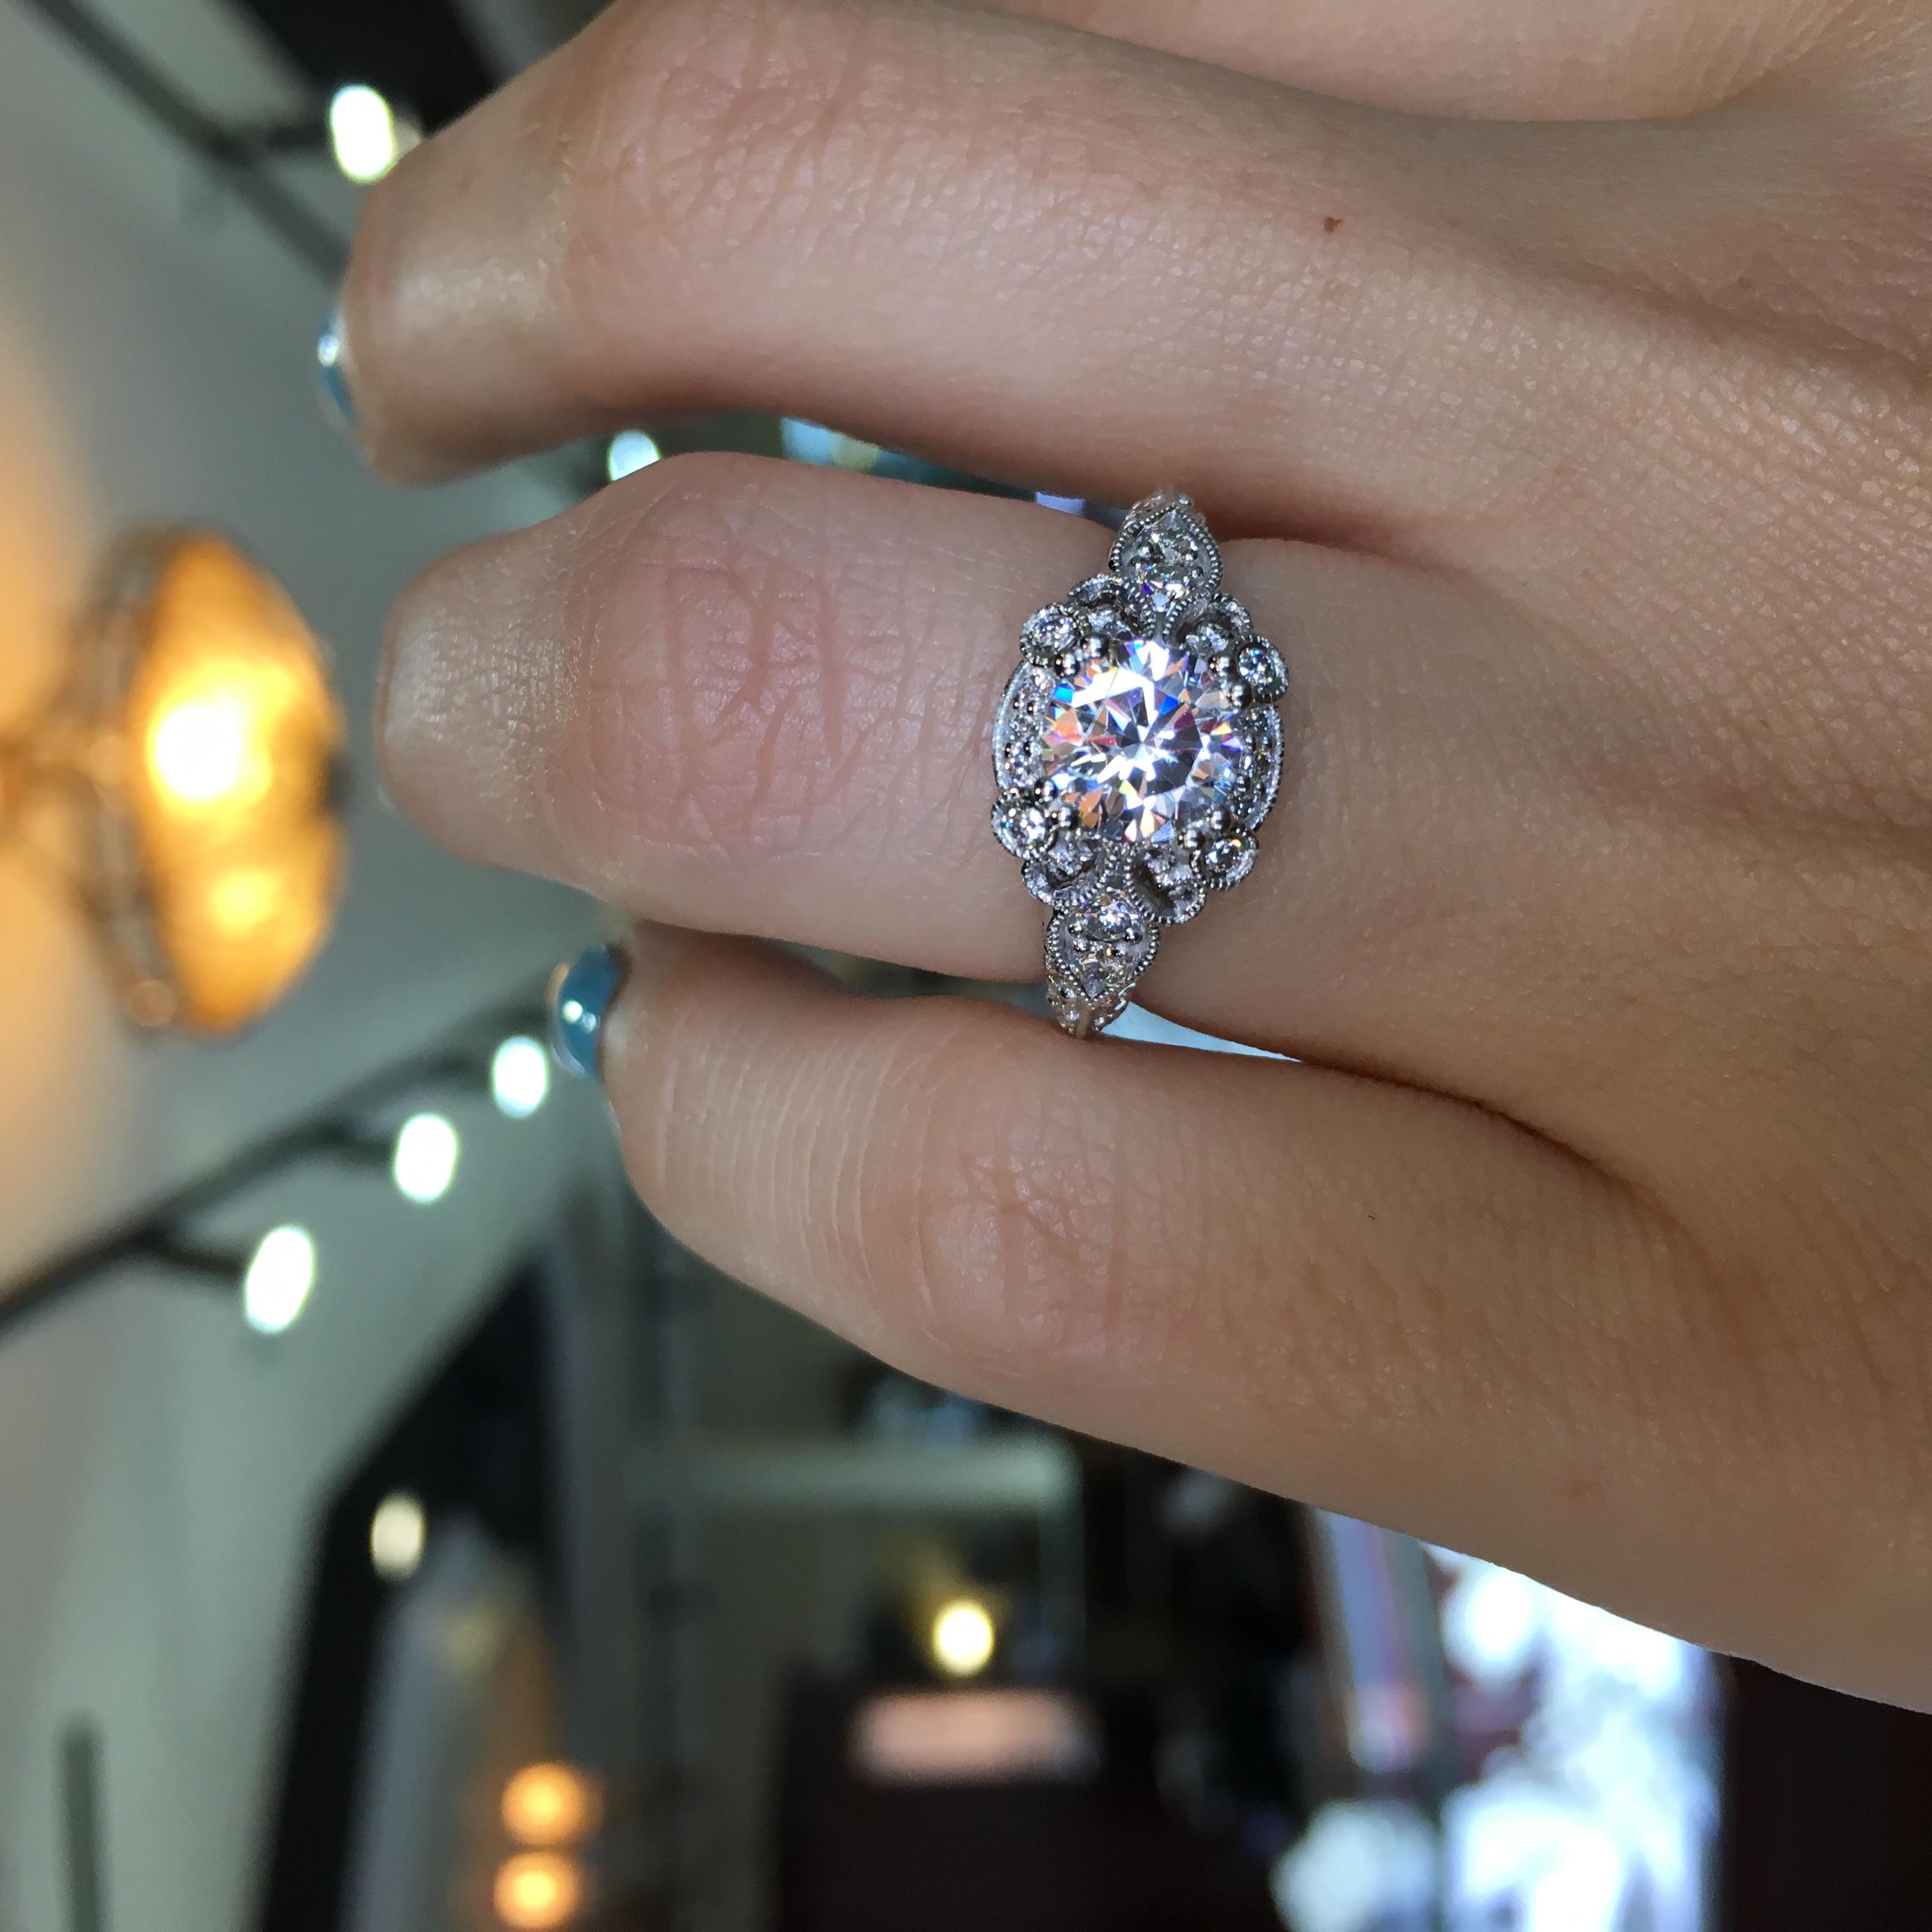 Gabriel Amp Co Engagement Rings Floral Halo 50 Accent Diamonds